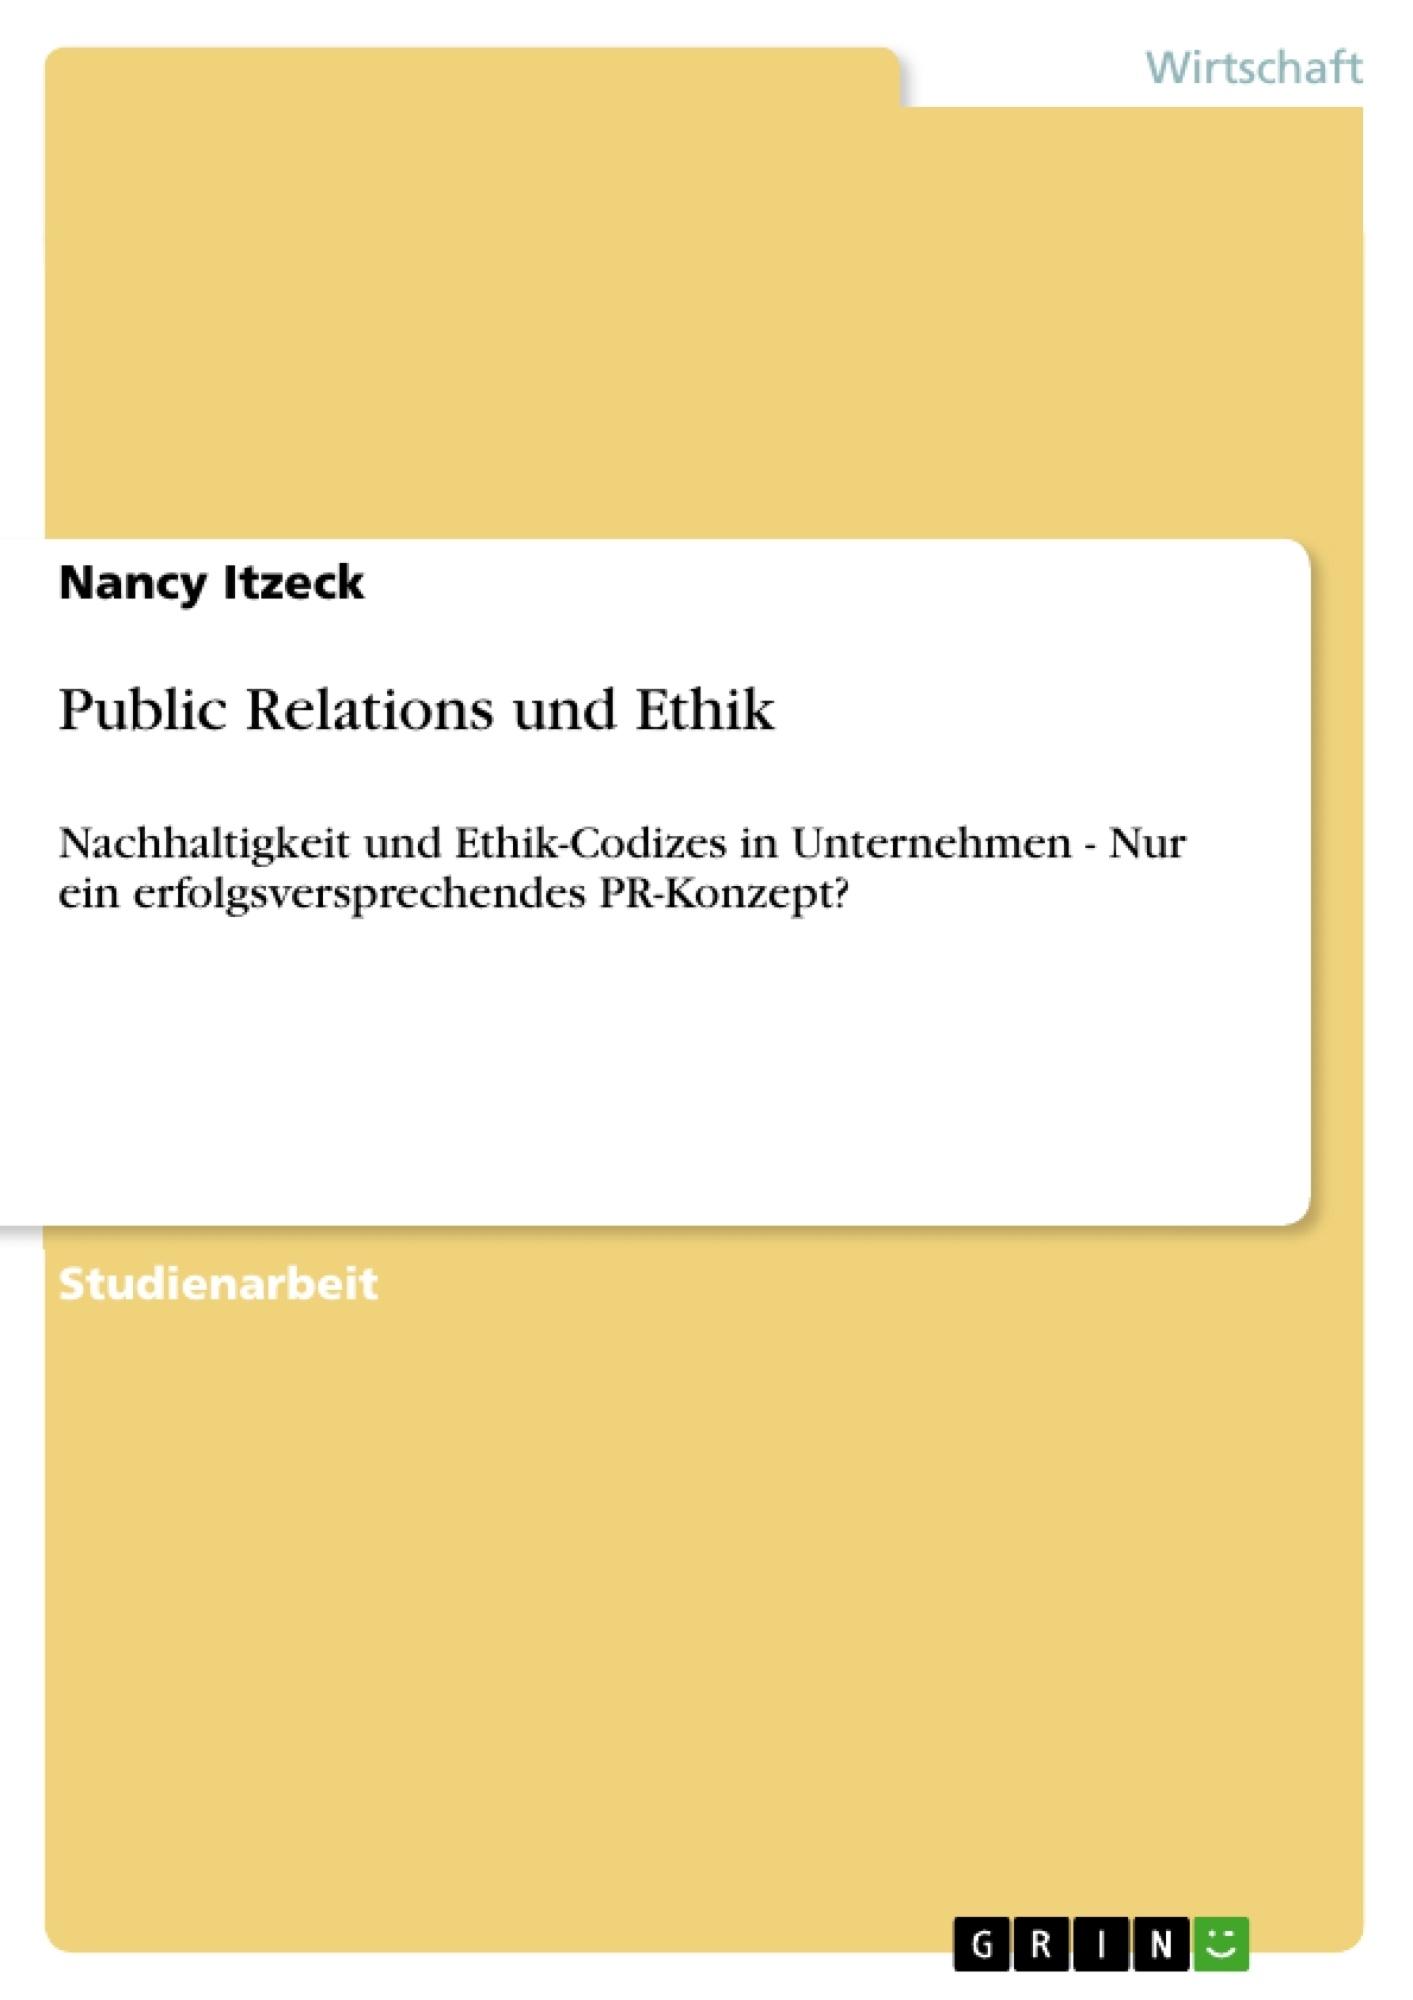 Titel: Public Relations und Ethik